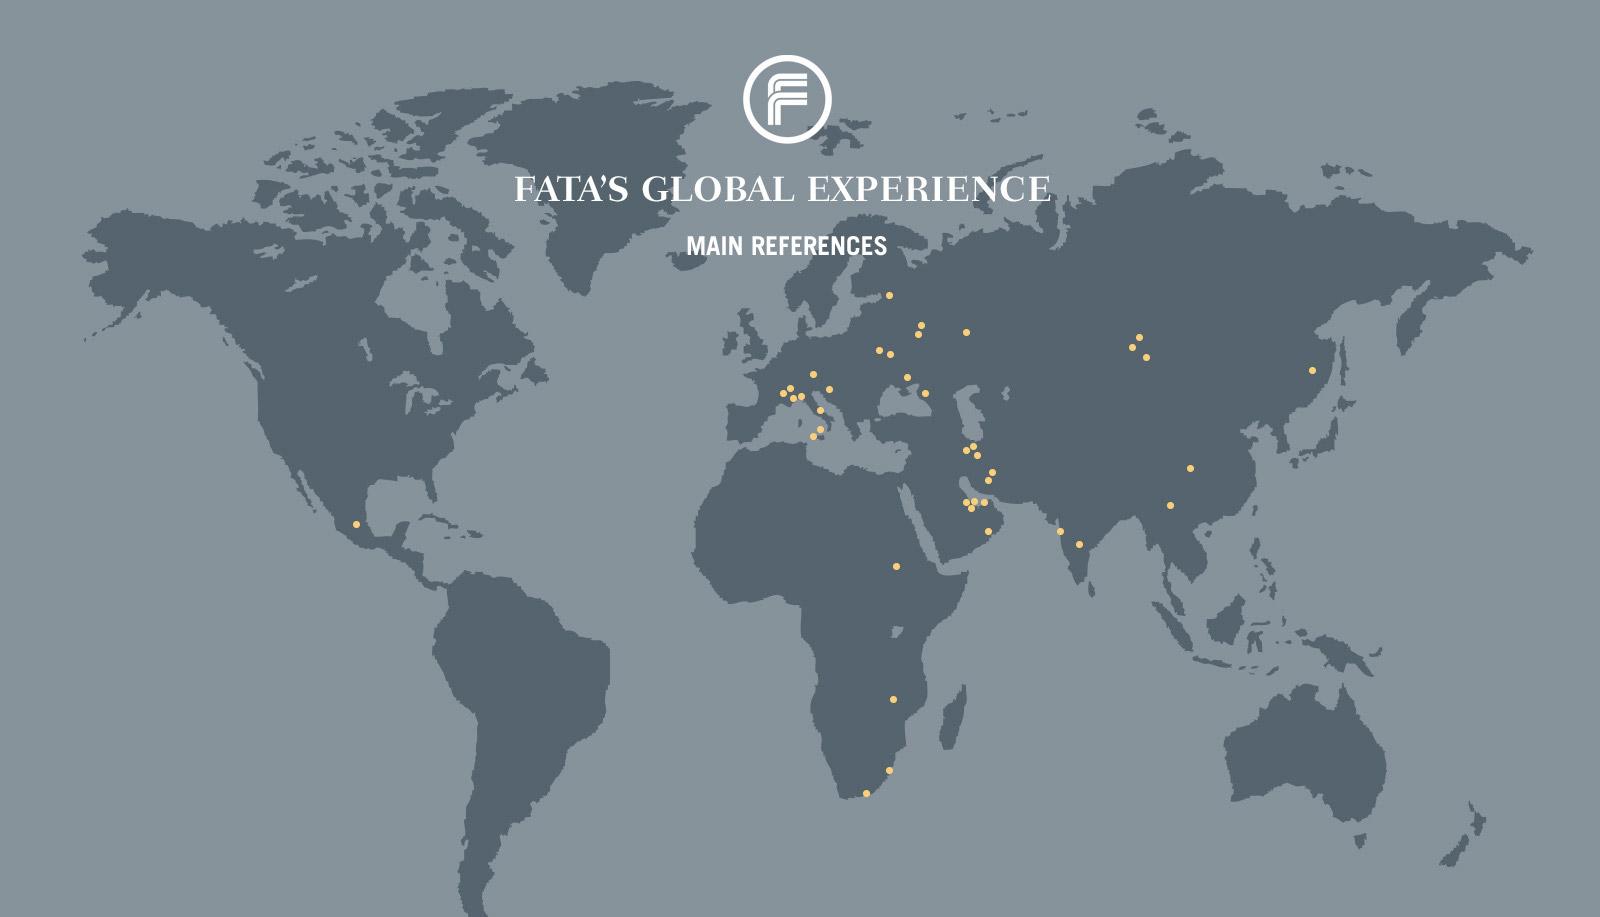 FATA Global Experience